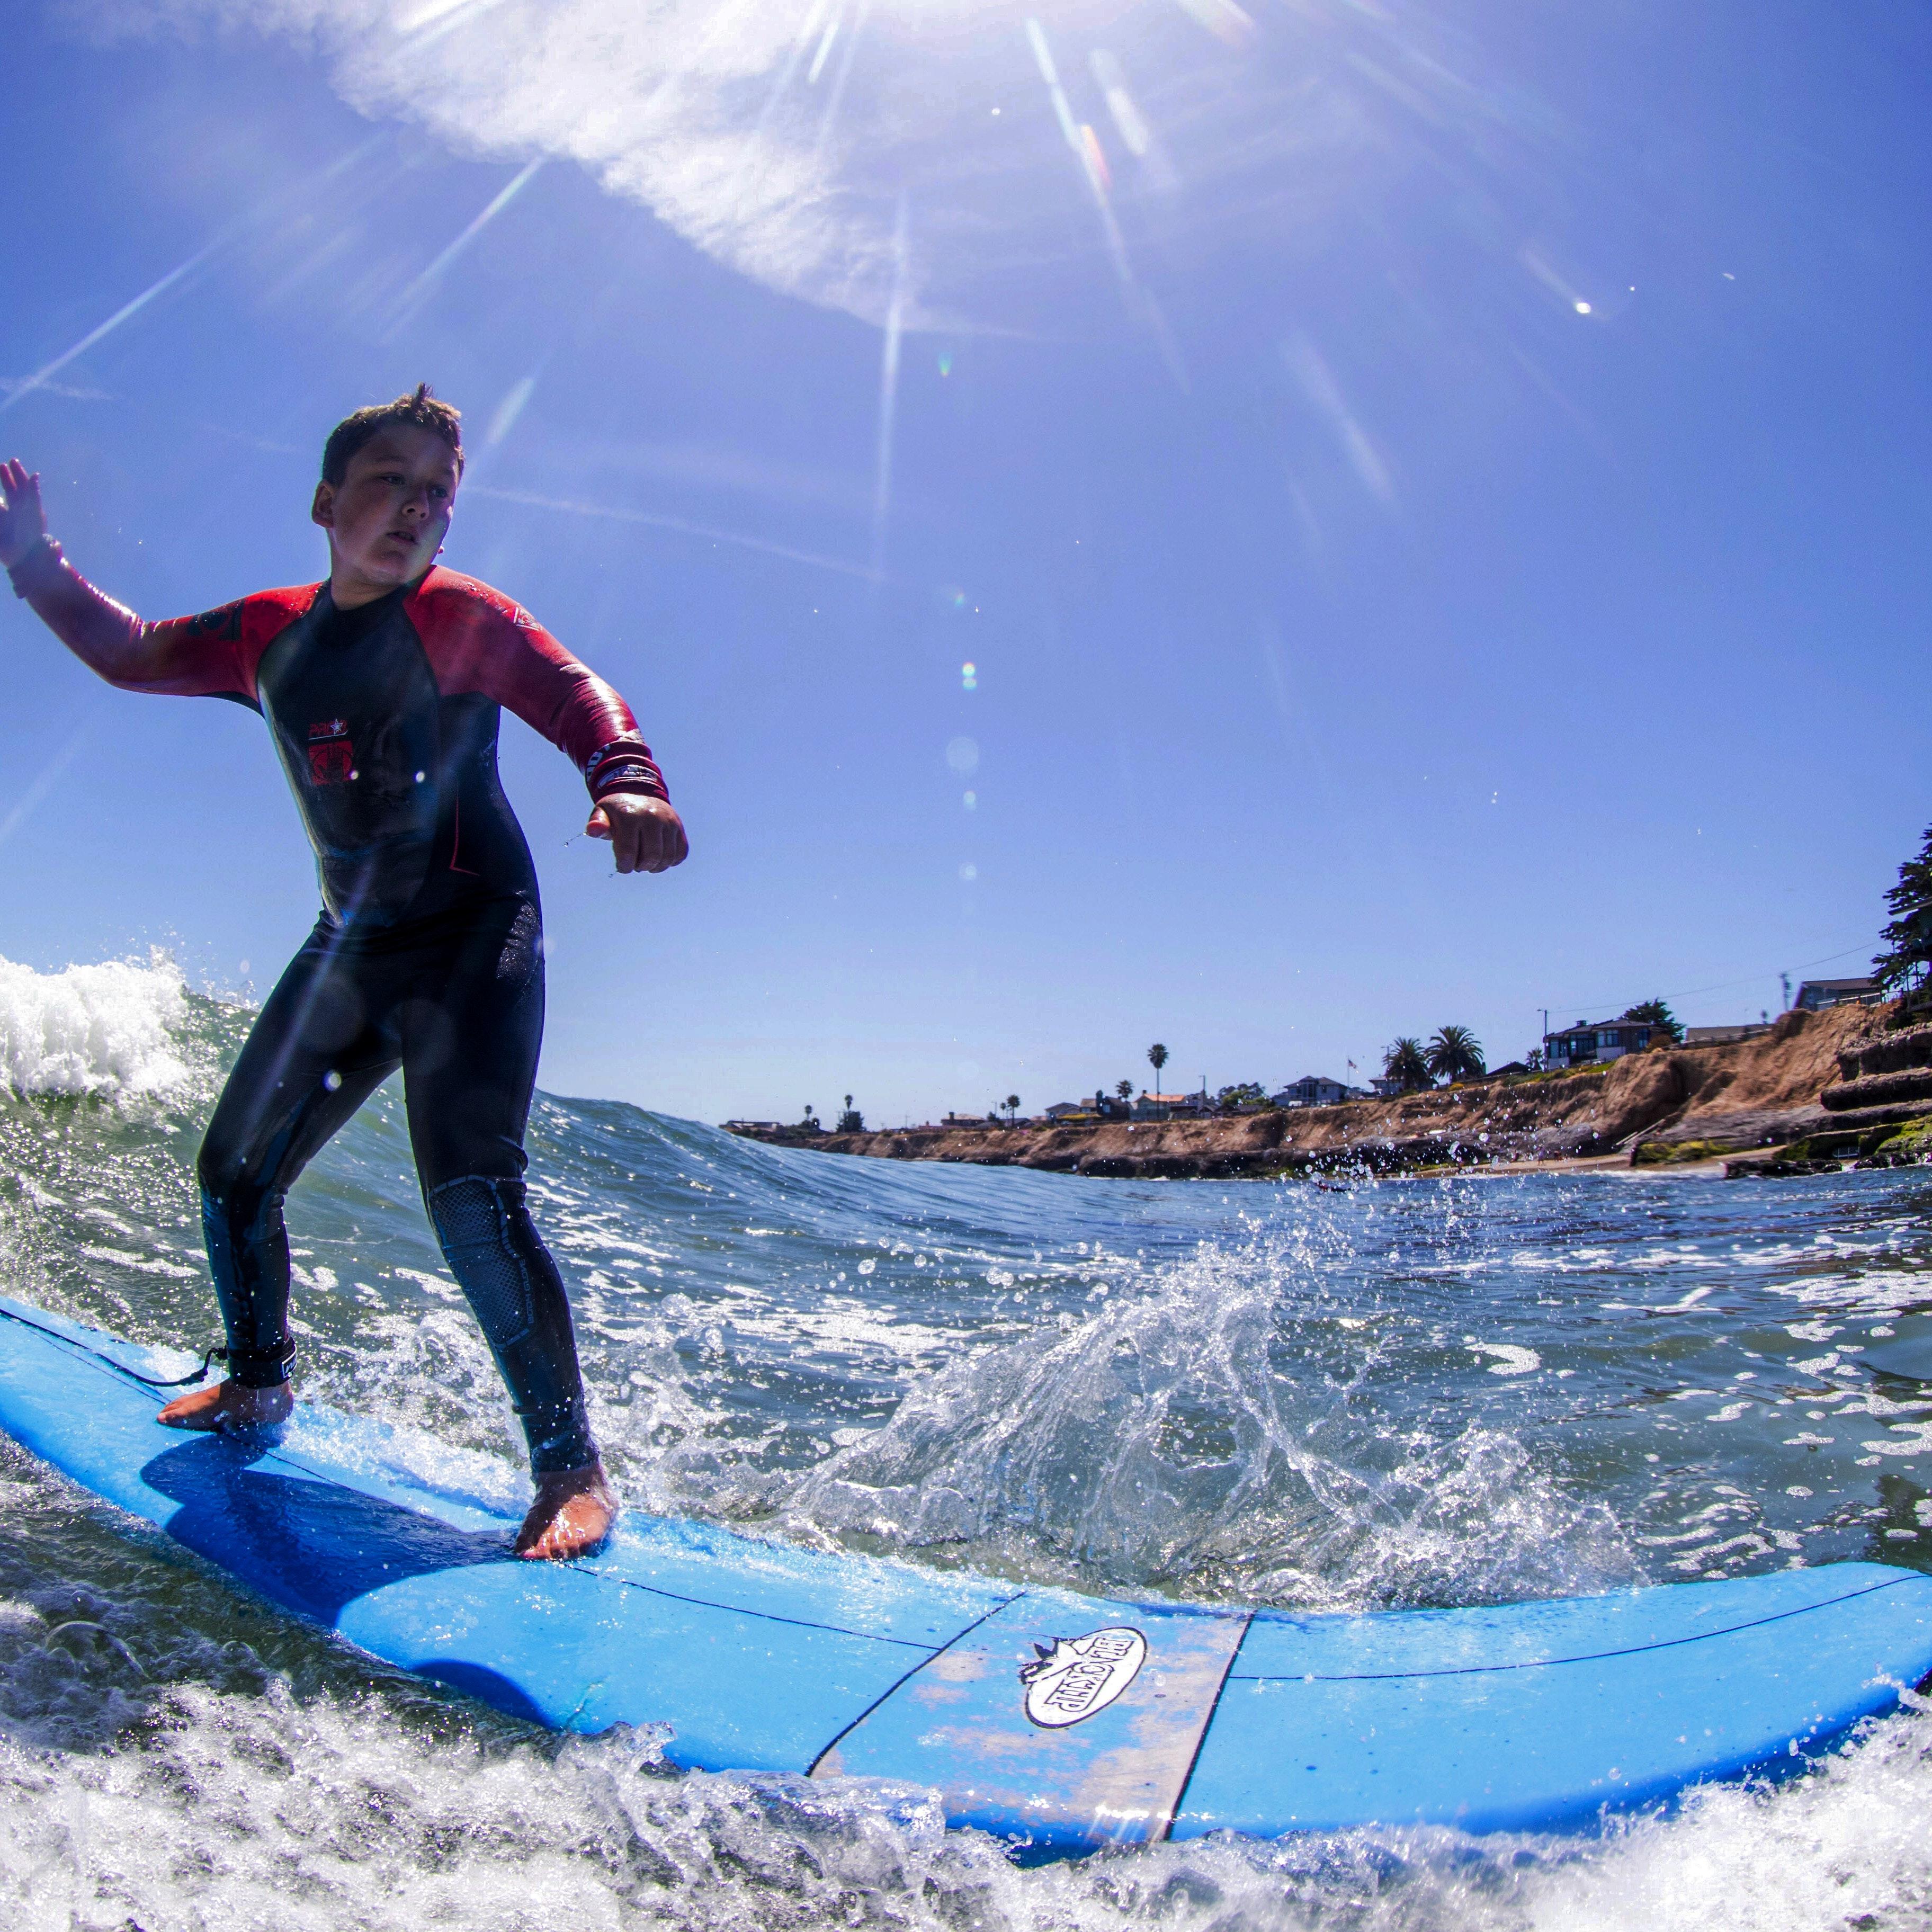 Boy learning to surf in Santa Cruz California